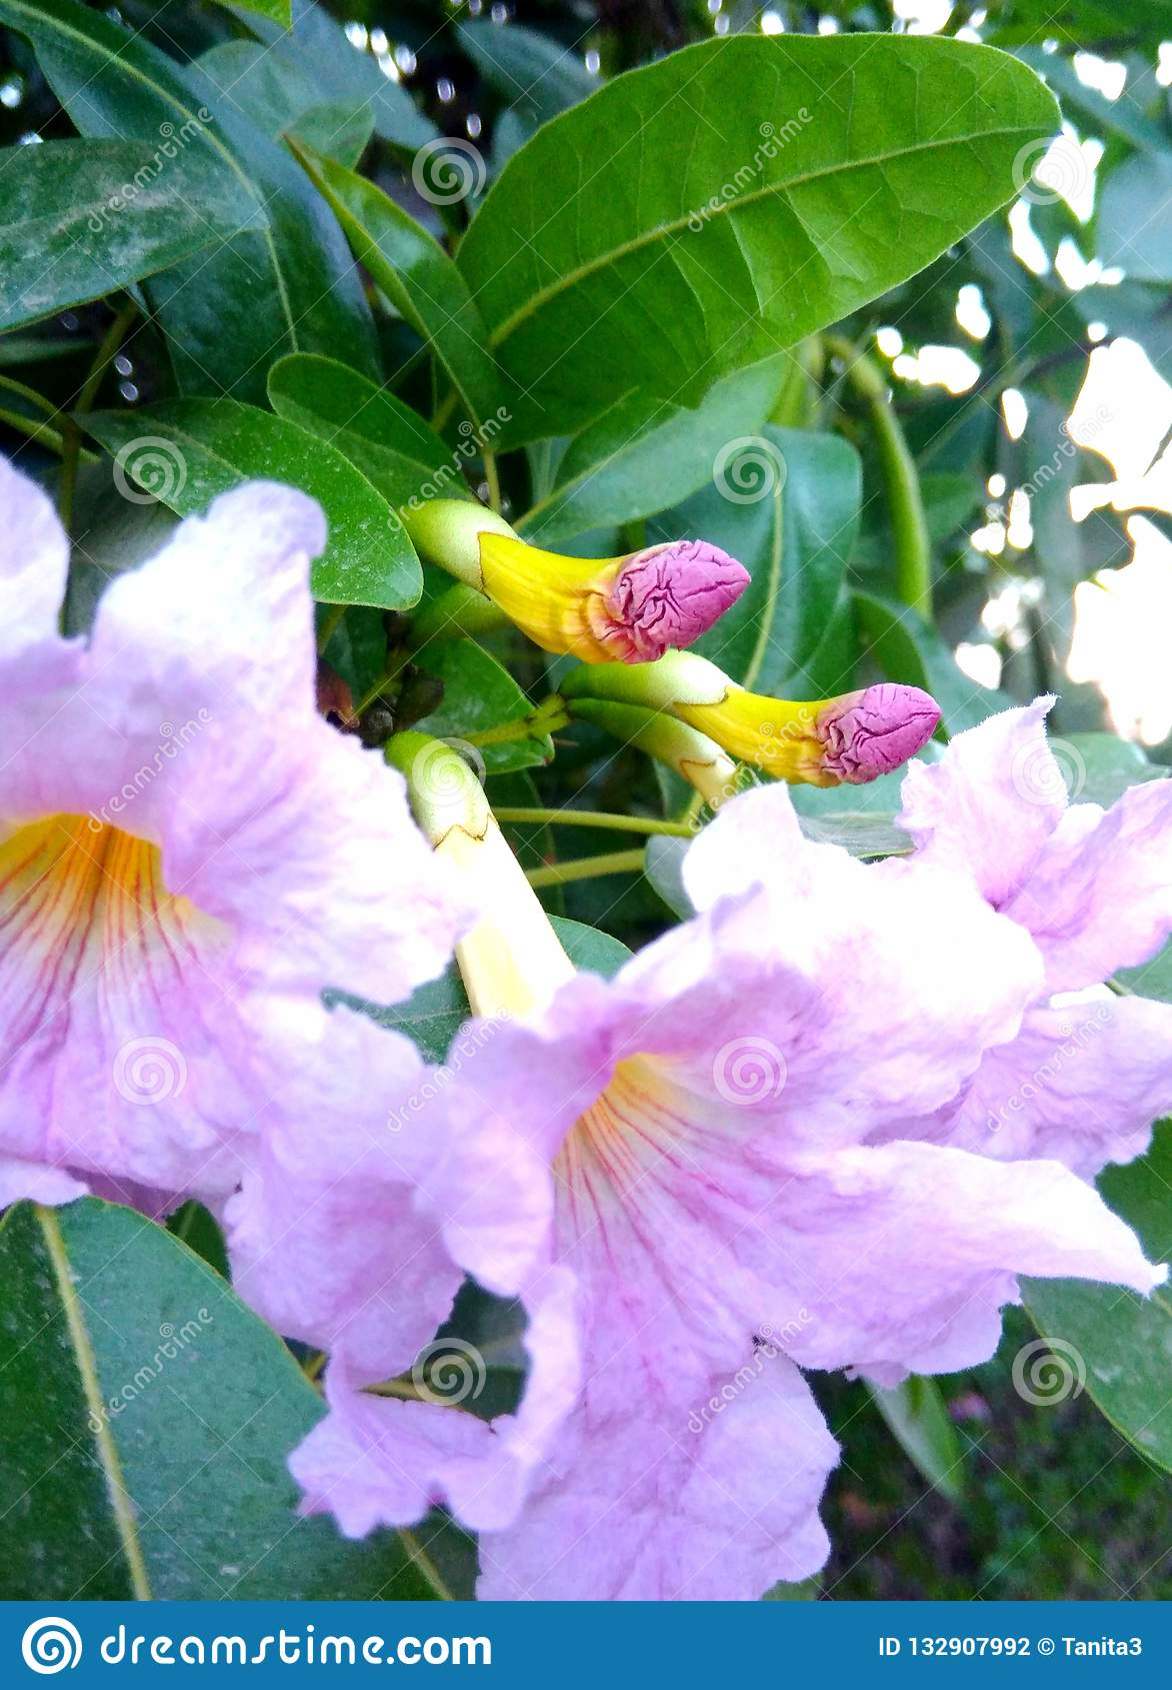 Pink flowers on a flowering tree